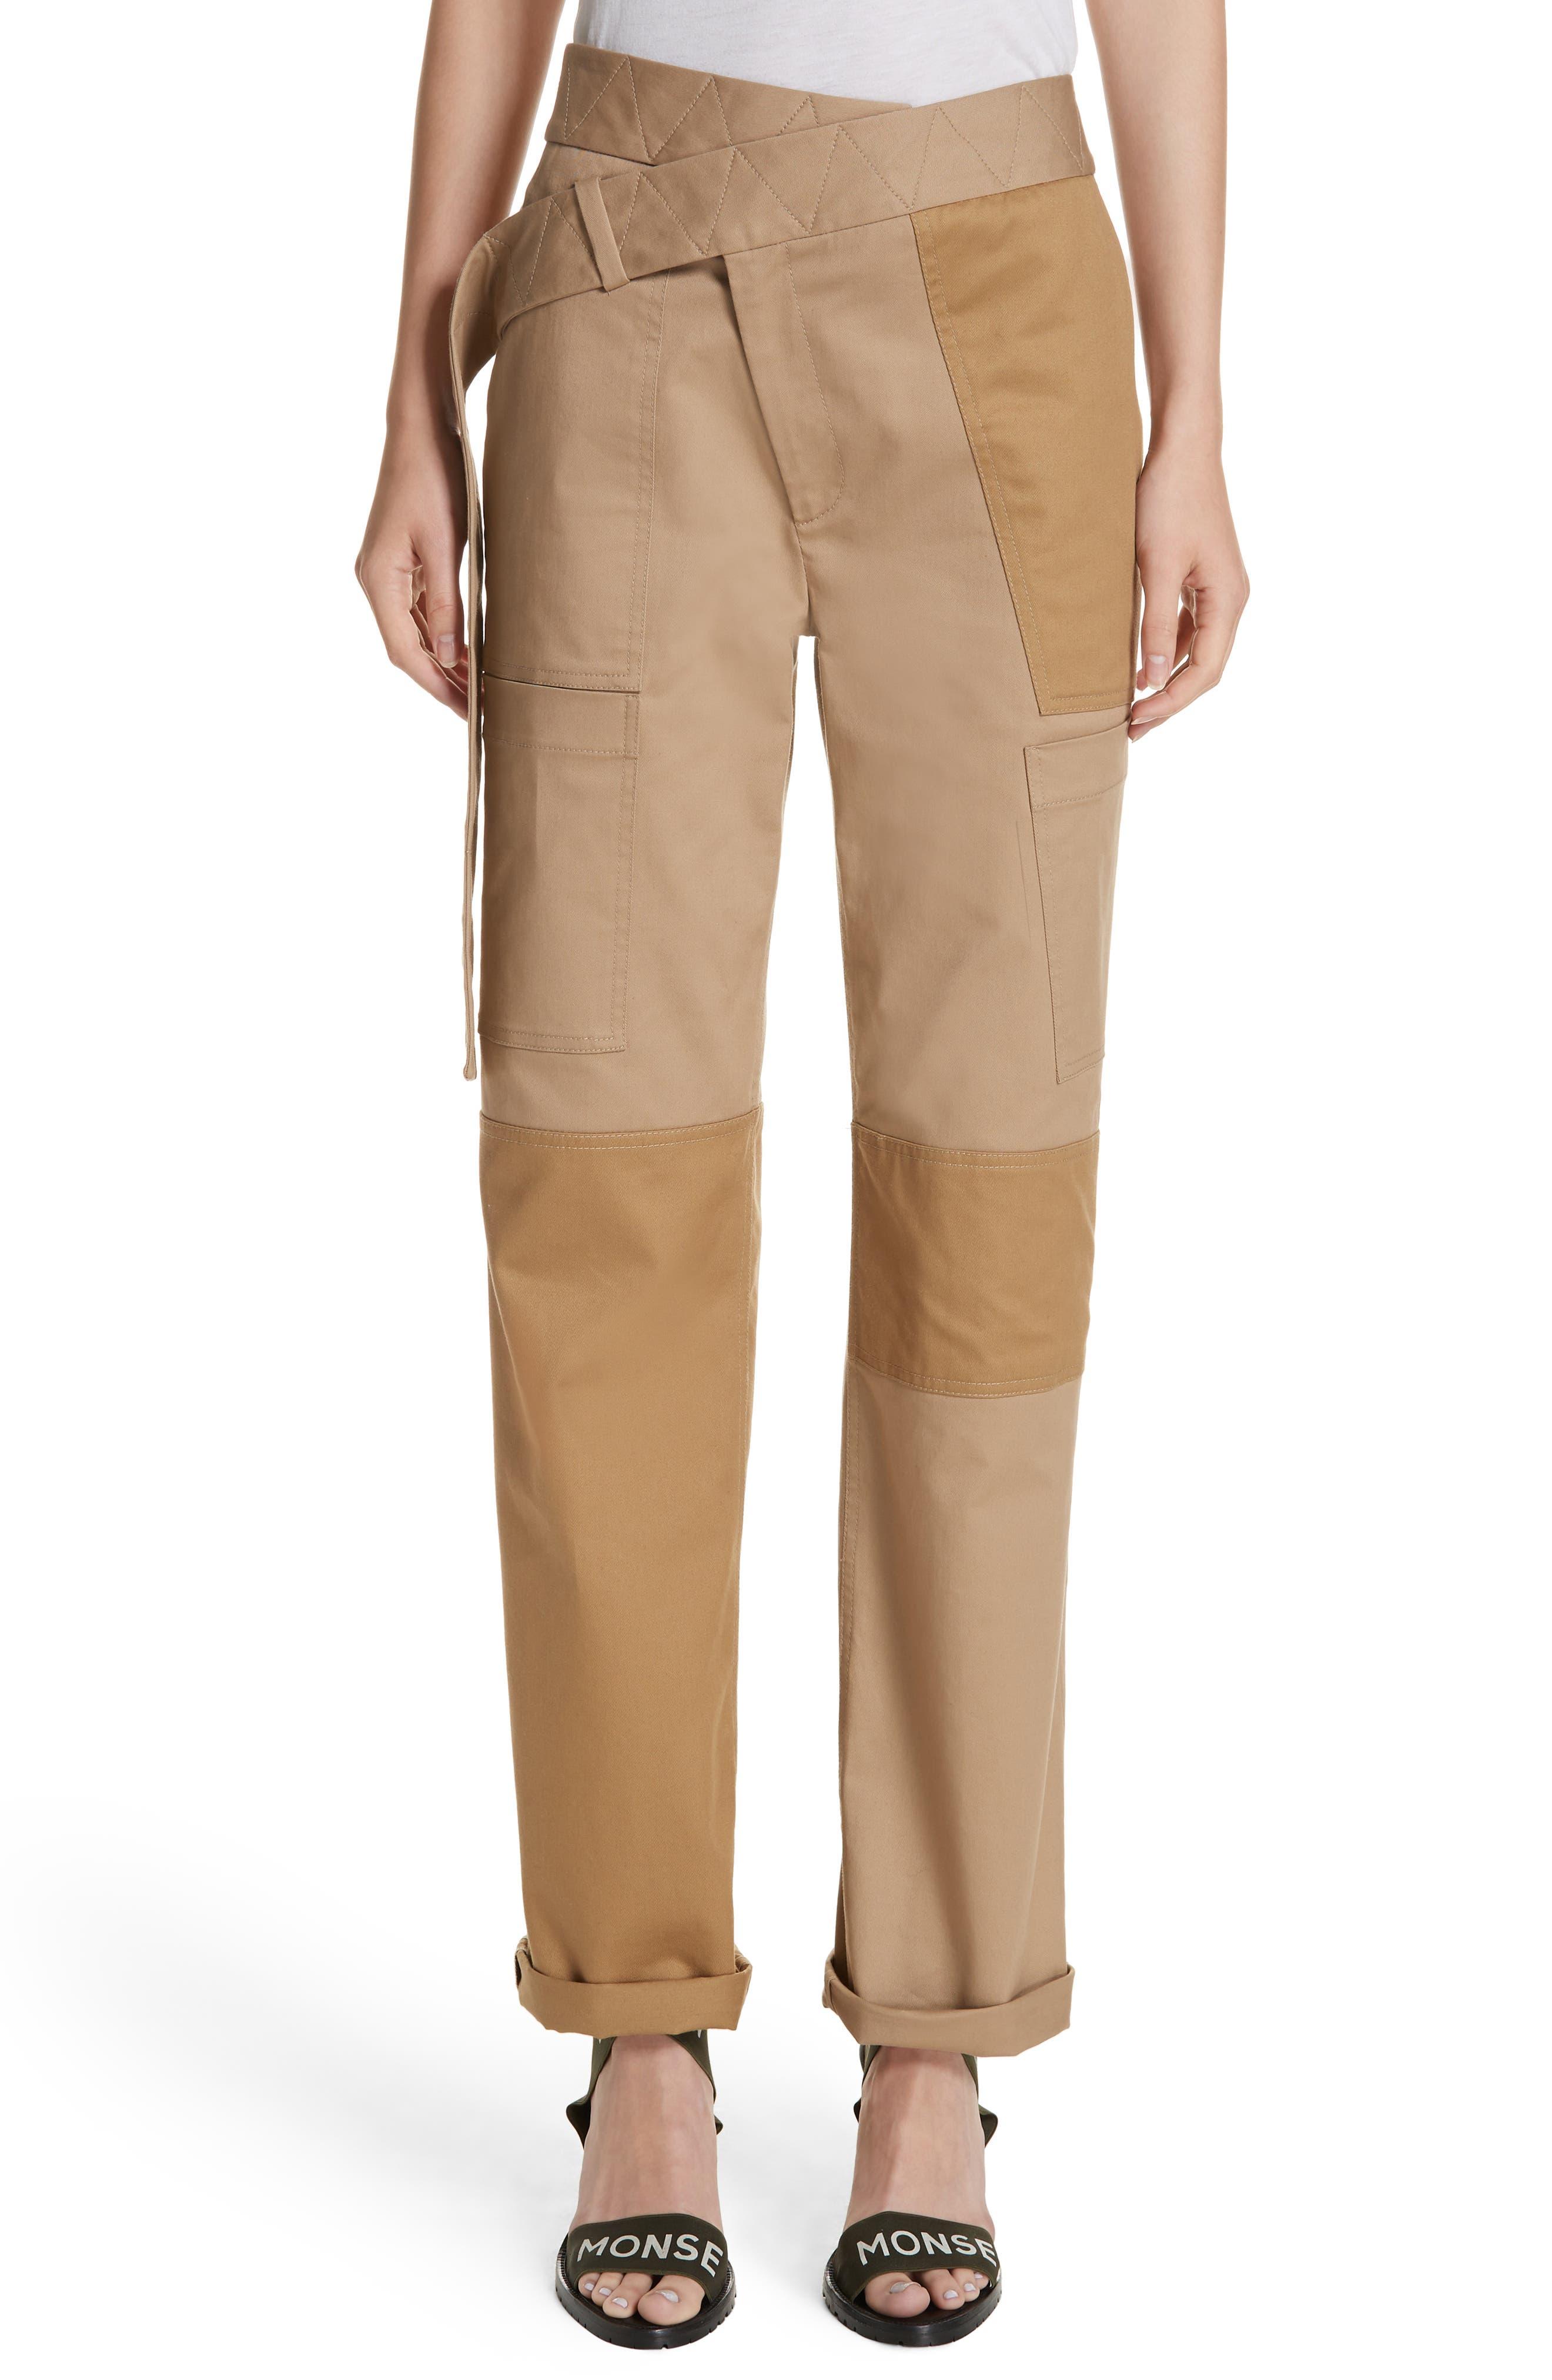 Monse Straight Leg Cargo Pants, Blue